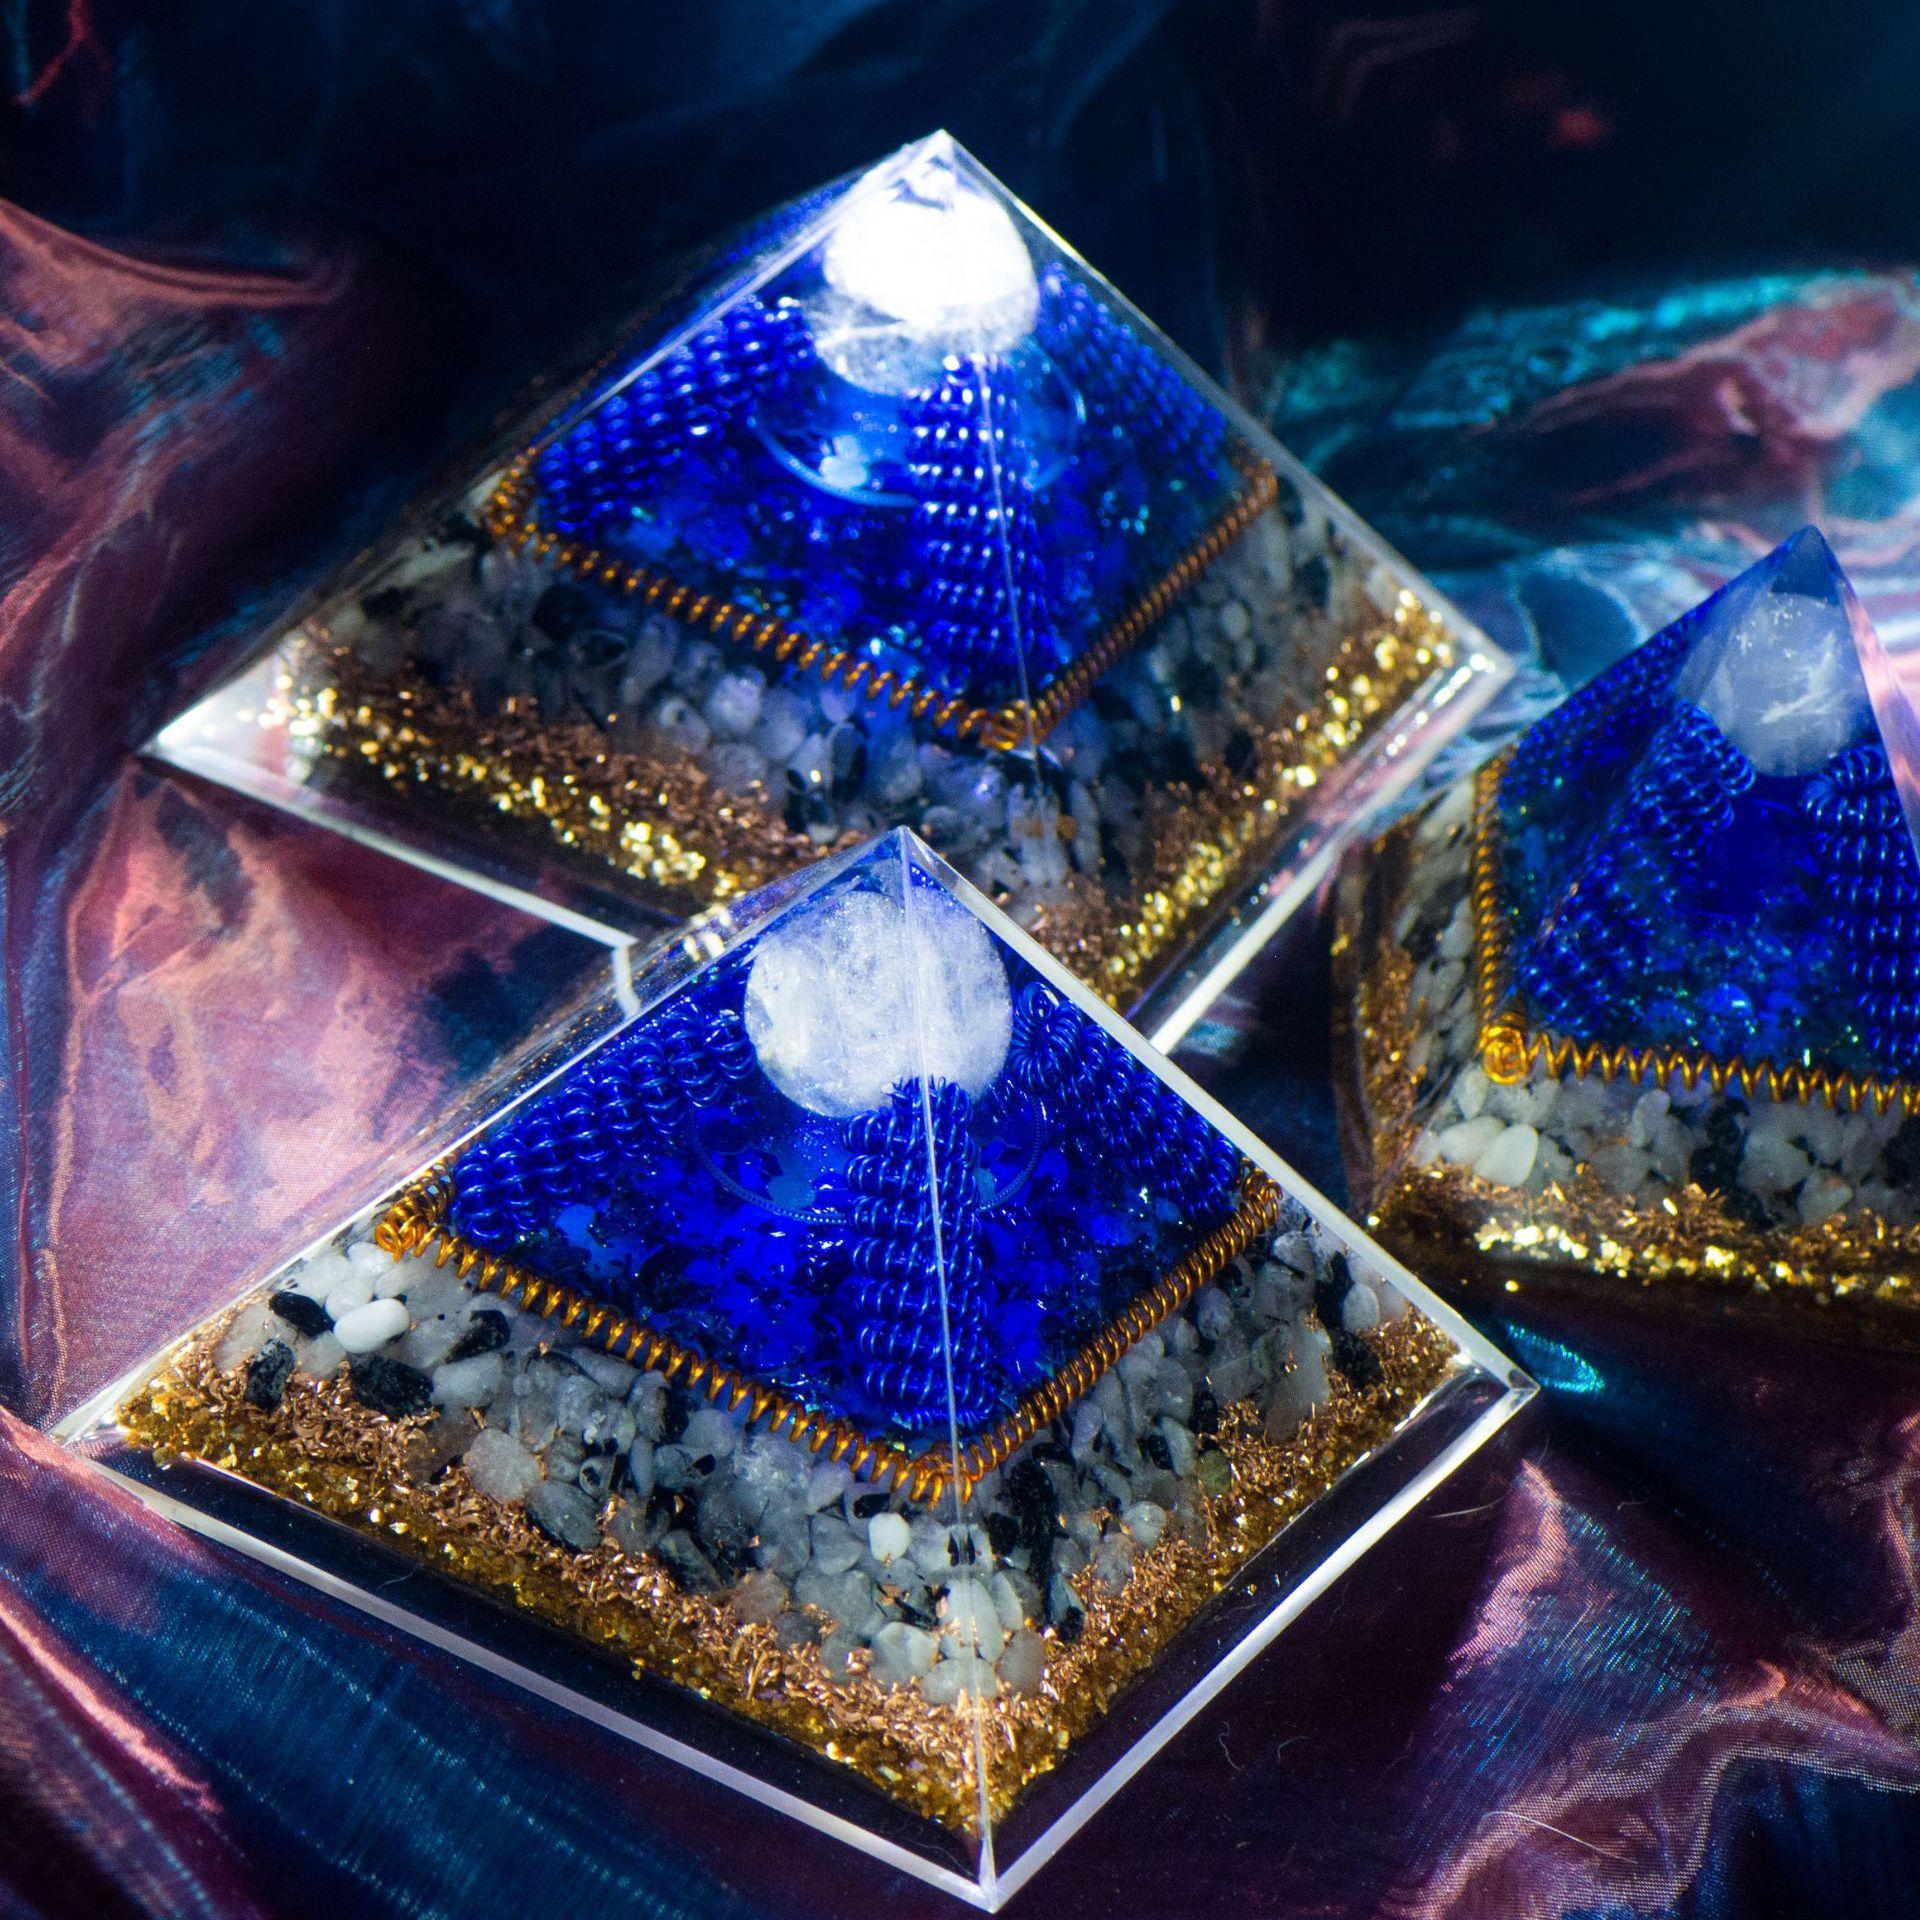 Natural Crystal Orgonite Energy Generator Gravel Healing Yoga Meditation Pyramid EMF Protection Original Resin Decorative Craft